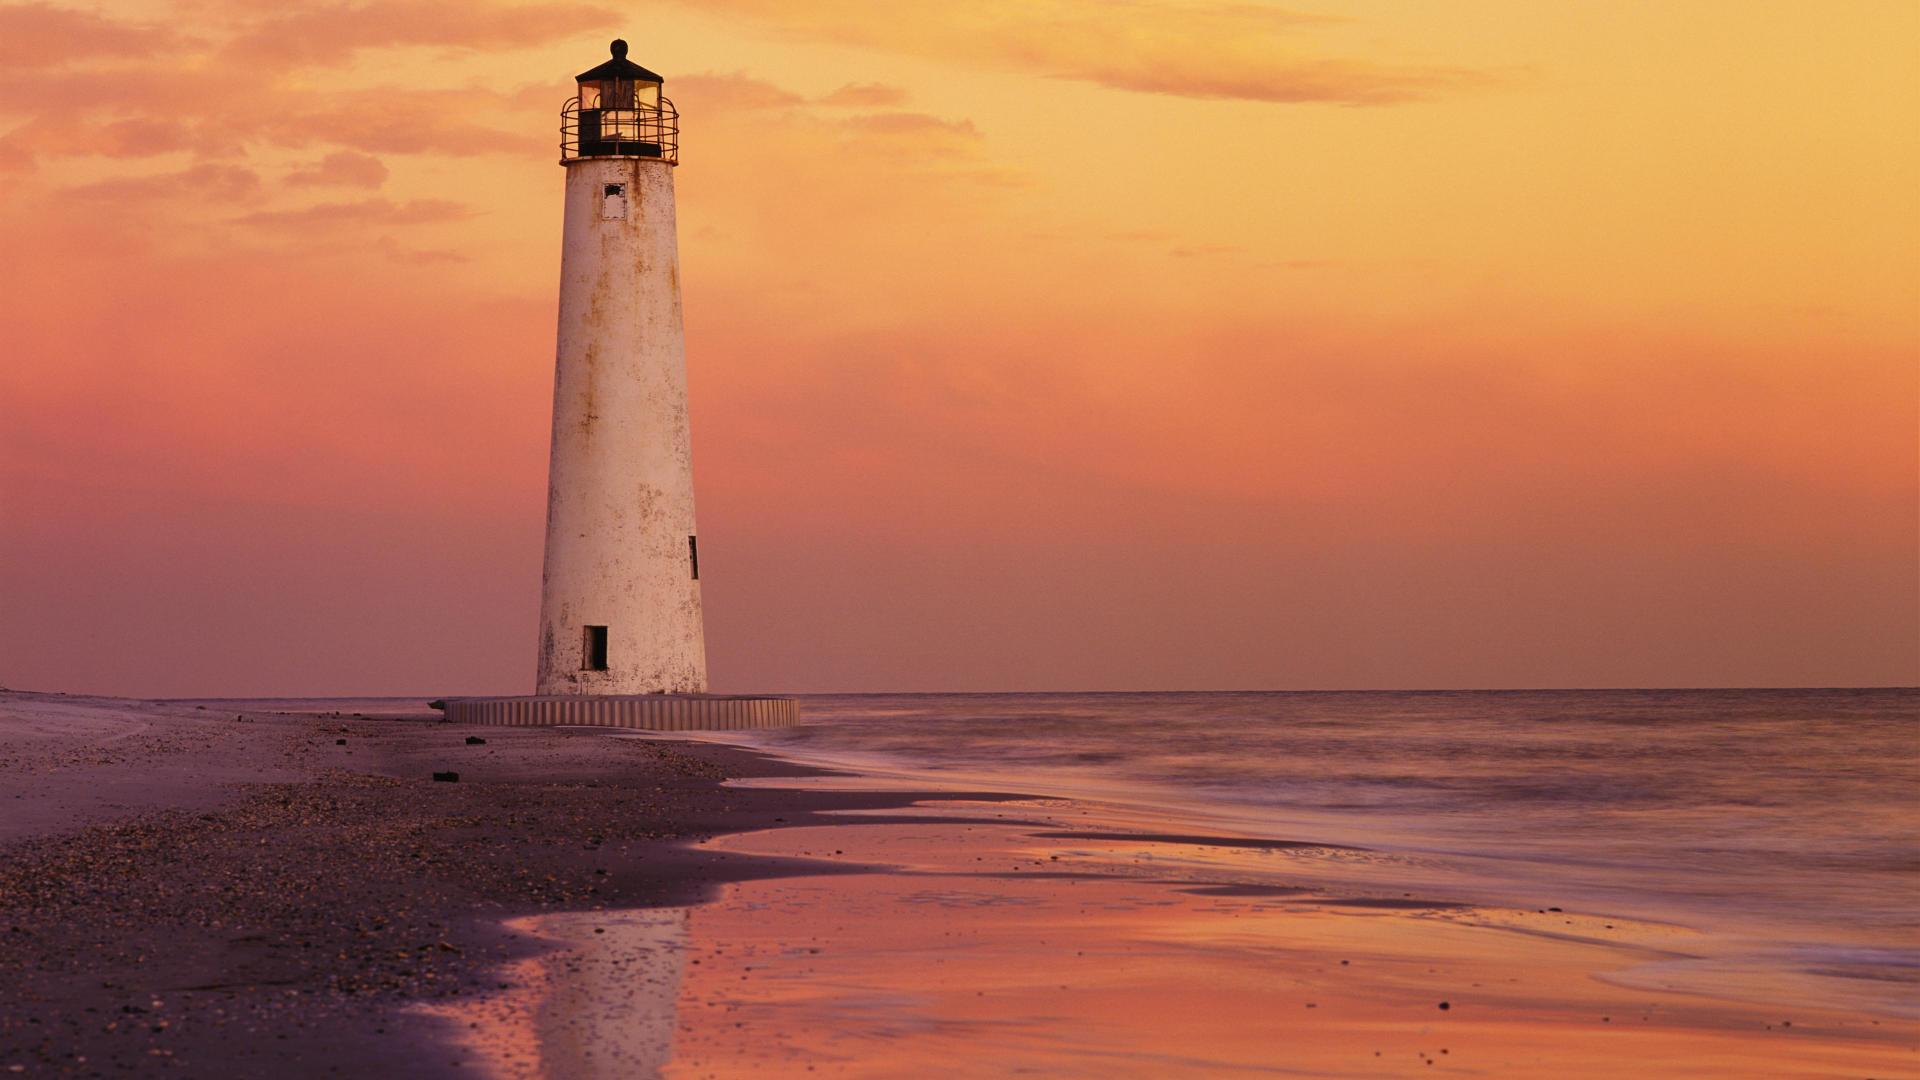 маяк небо море дом  № 3968886 без смс